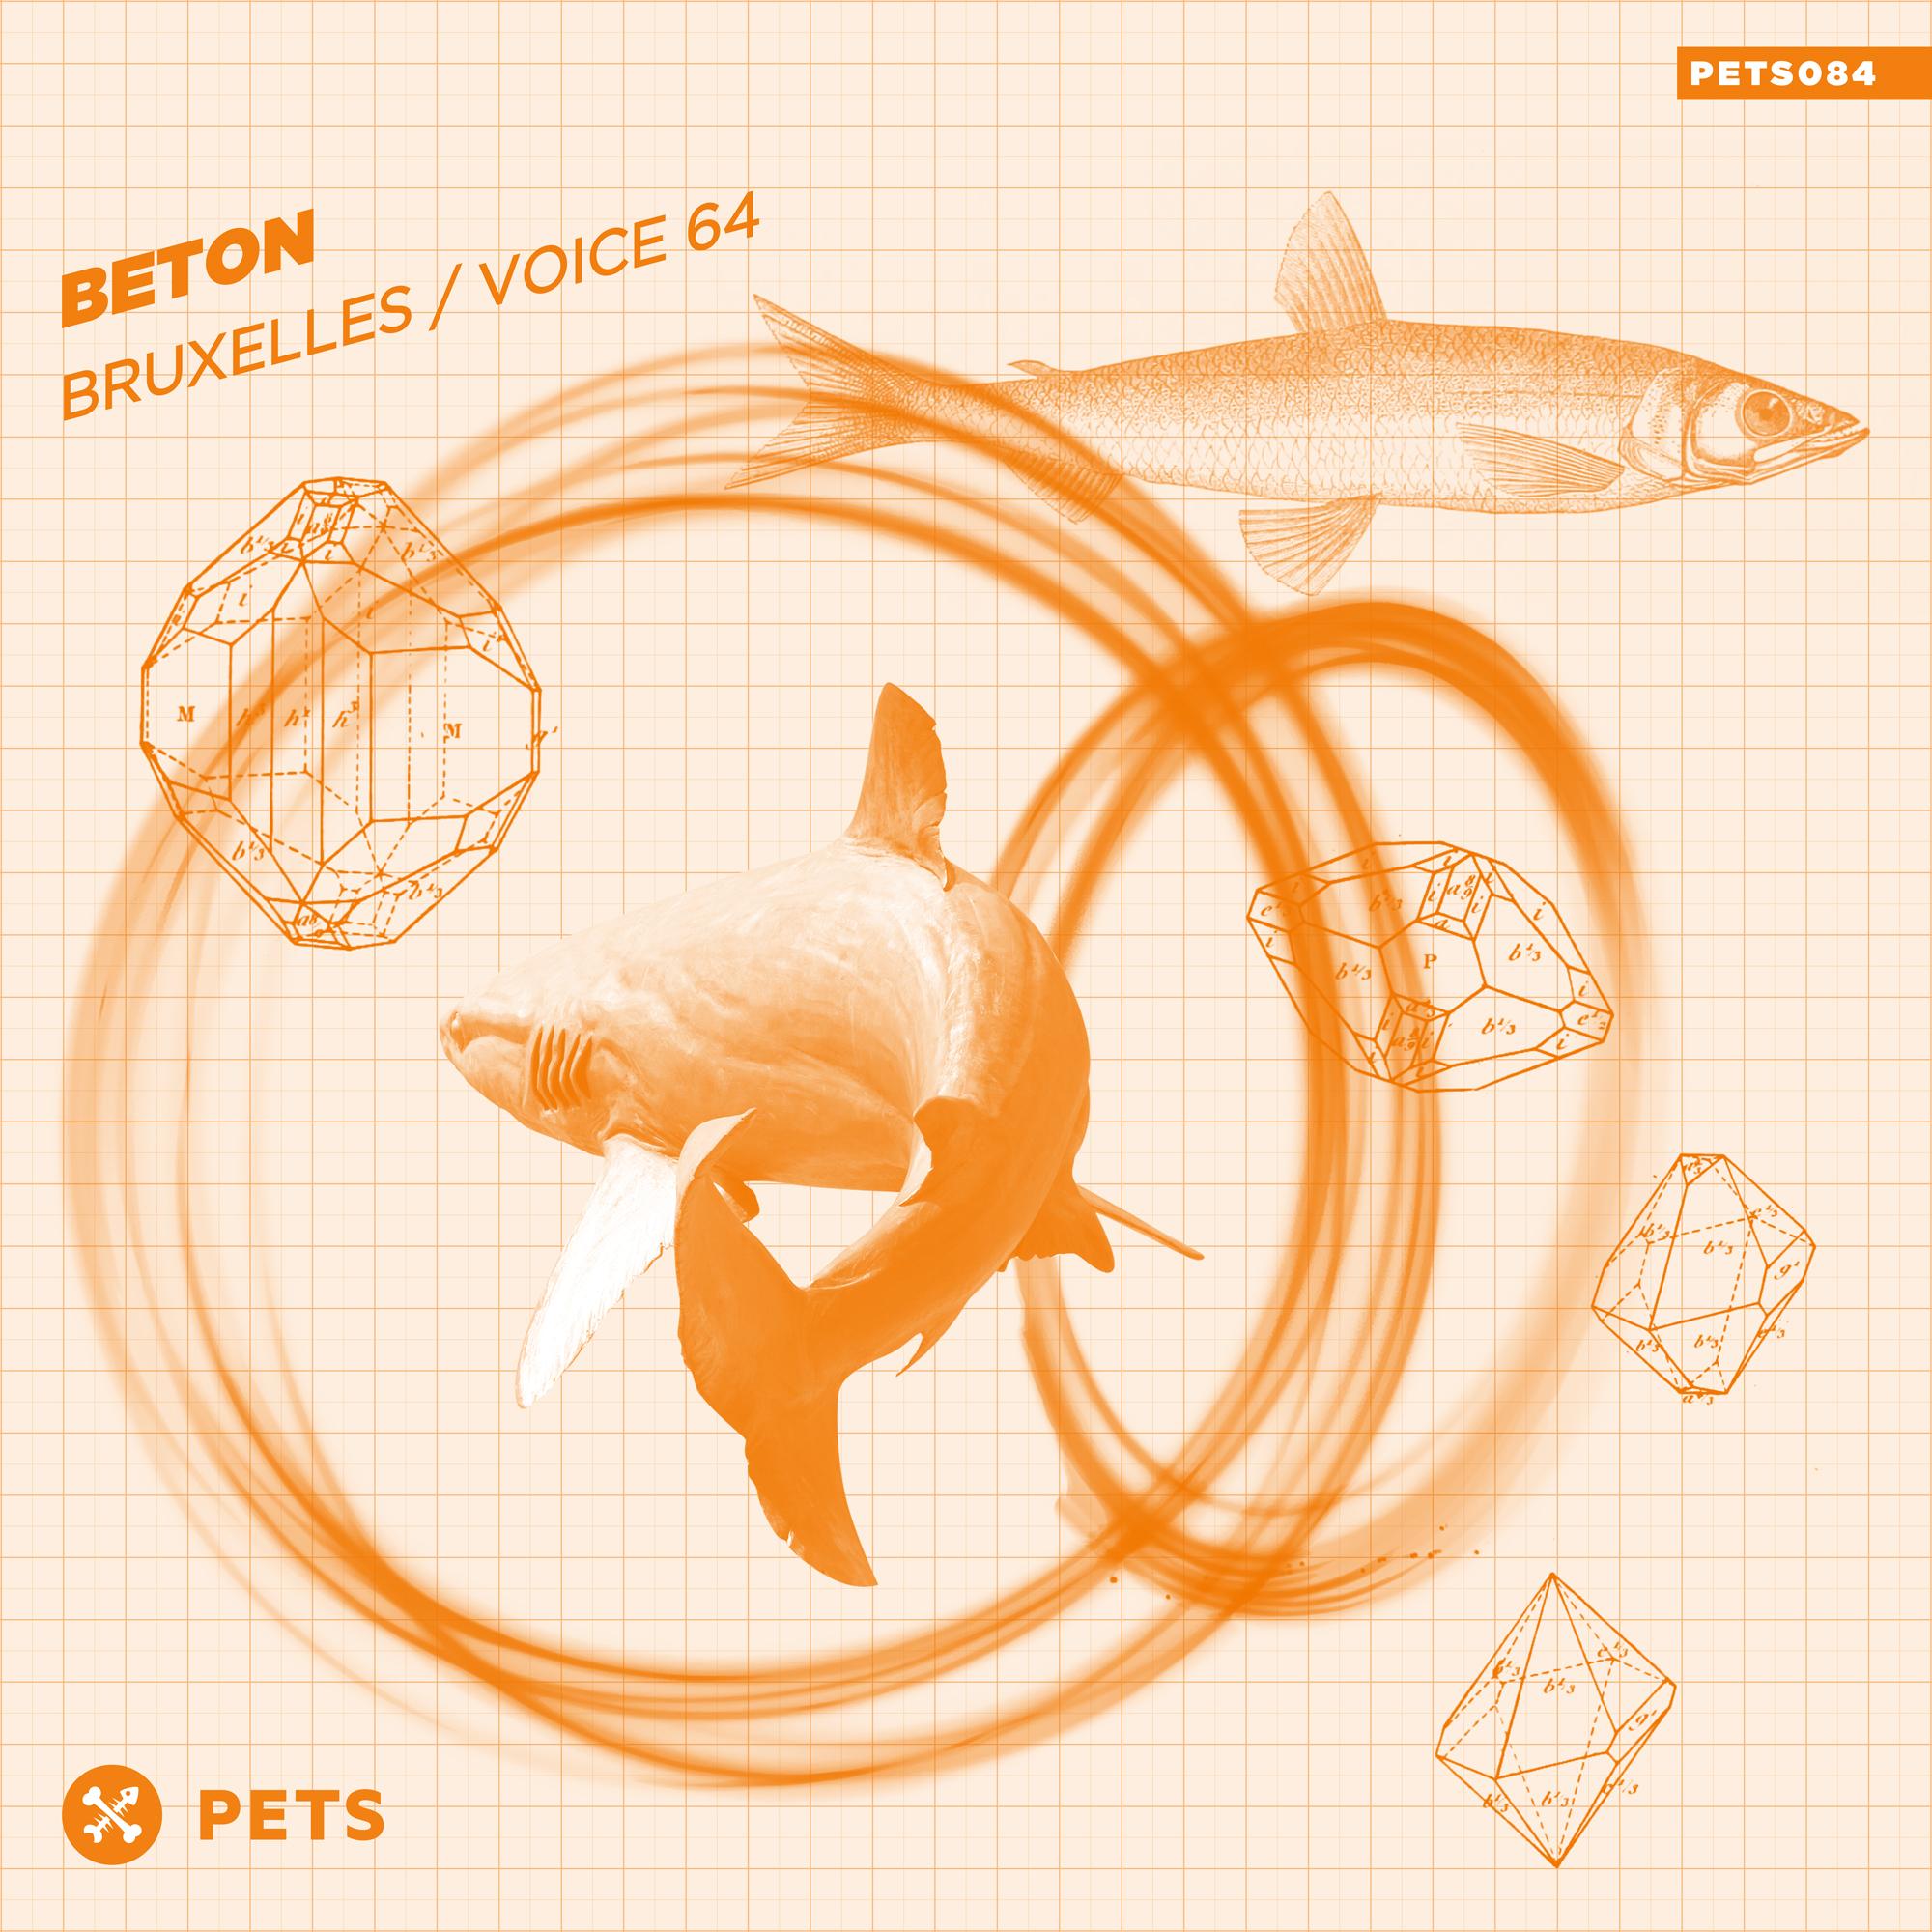 BETON - Bruxelles / Voice 64 EP